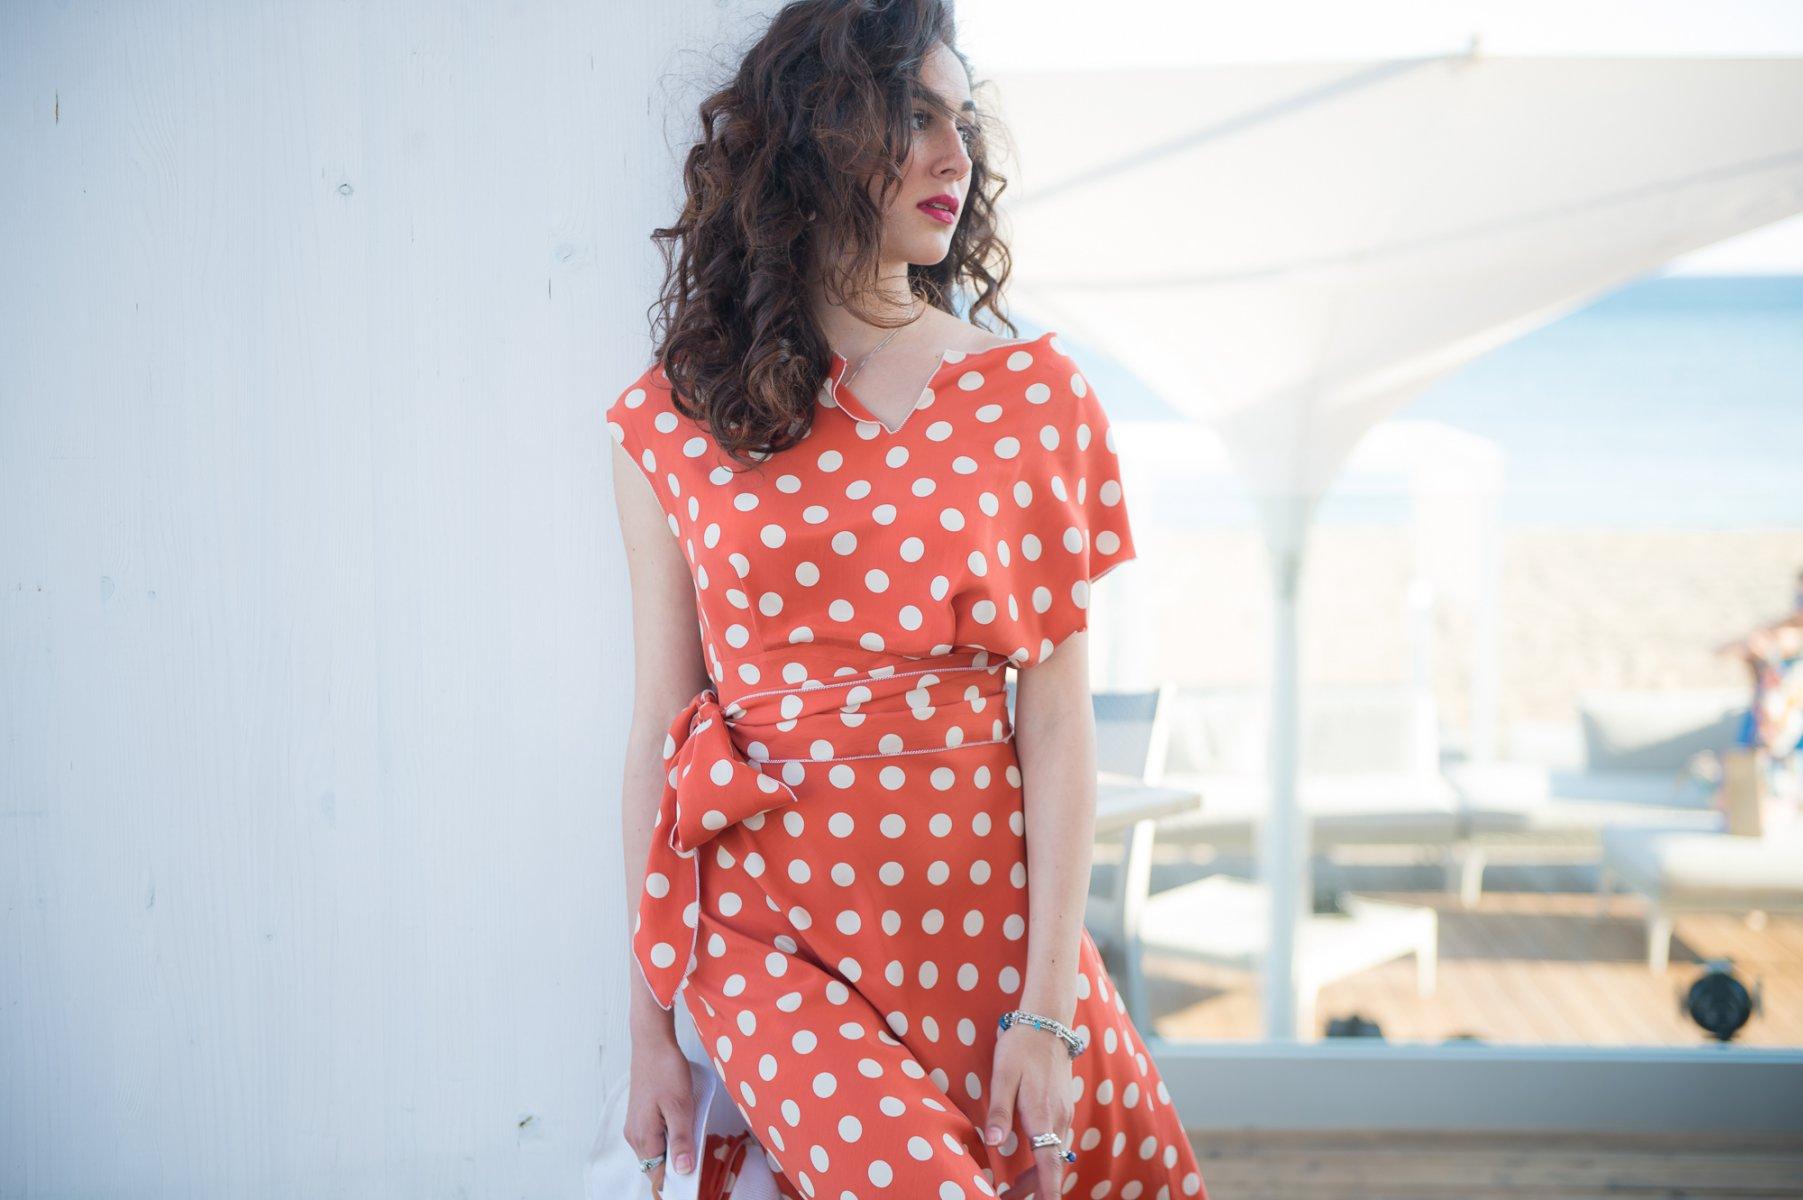 201-Pretty_Woman_MMD9545 Fashion/Adv